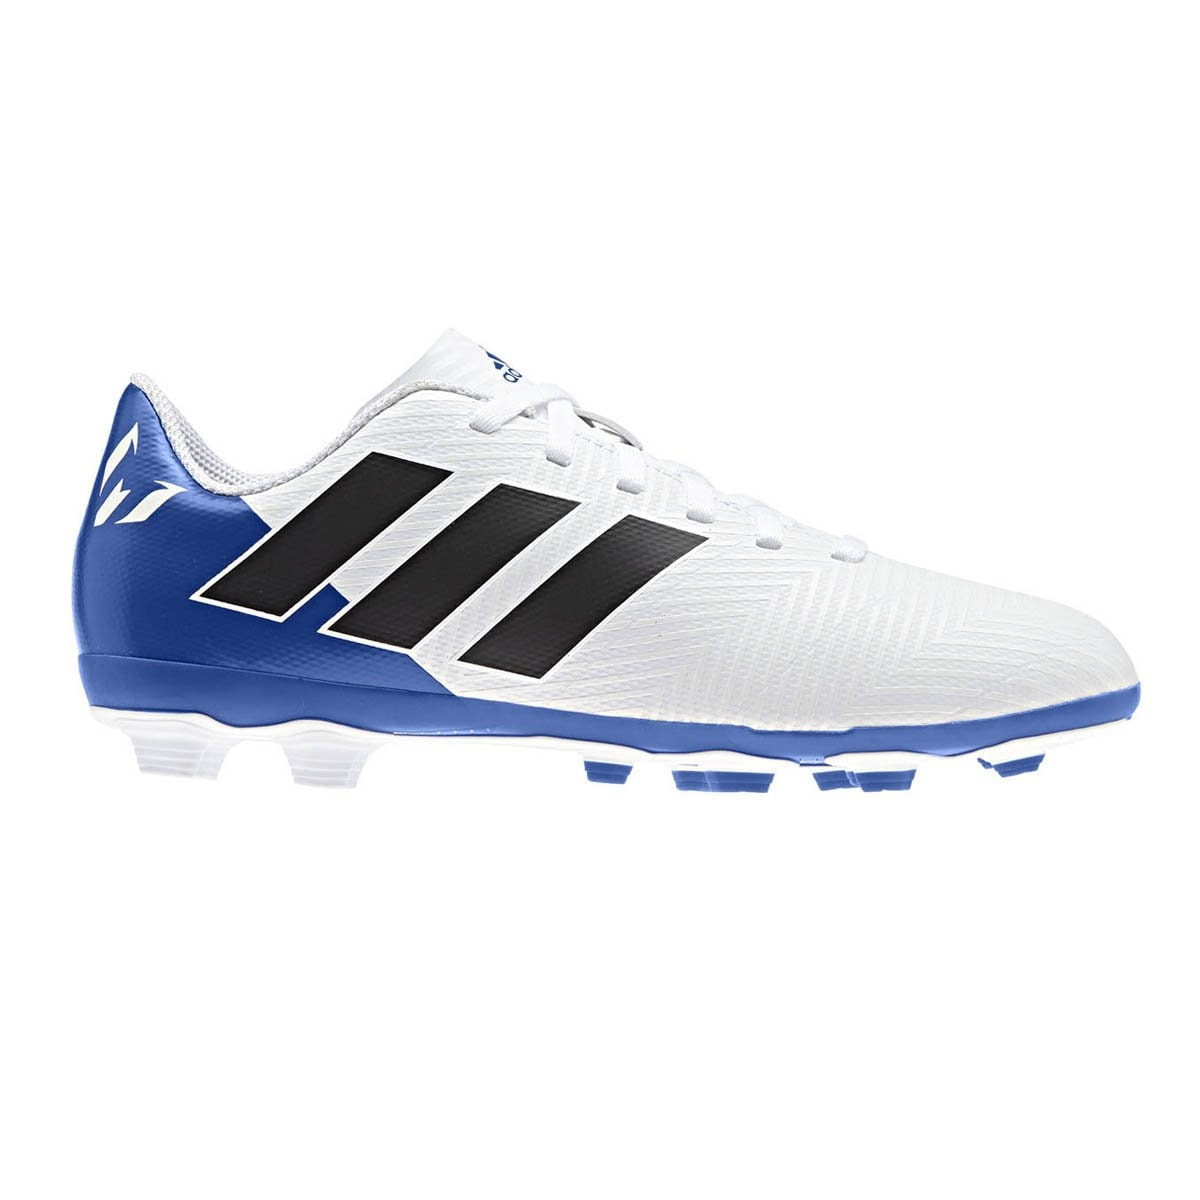 Calzado Soccer Nemeziz Messi 18.4  Adidas  - Infantil